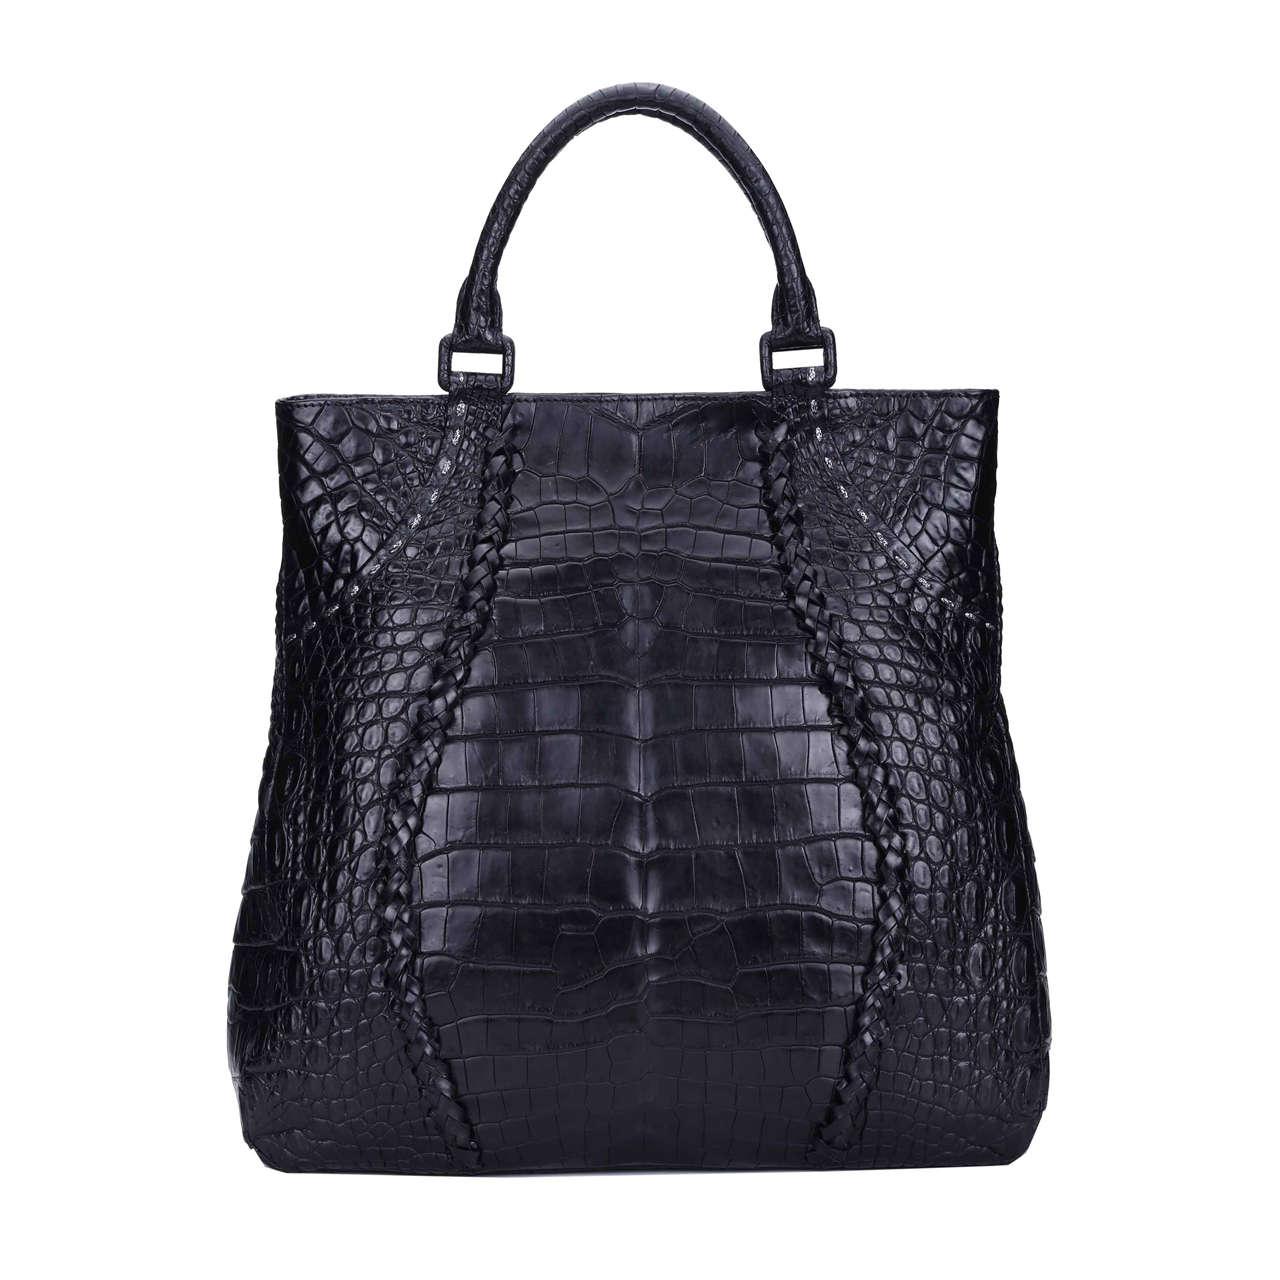 GF bags-Custom Latest Handbags Manufacturer, Cheap Handbags Online | Handbag-4